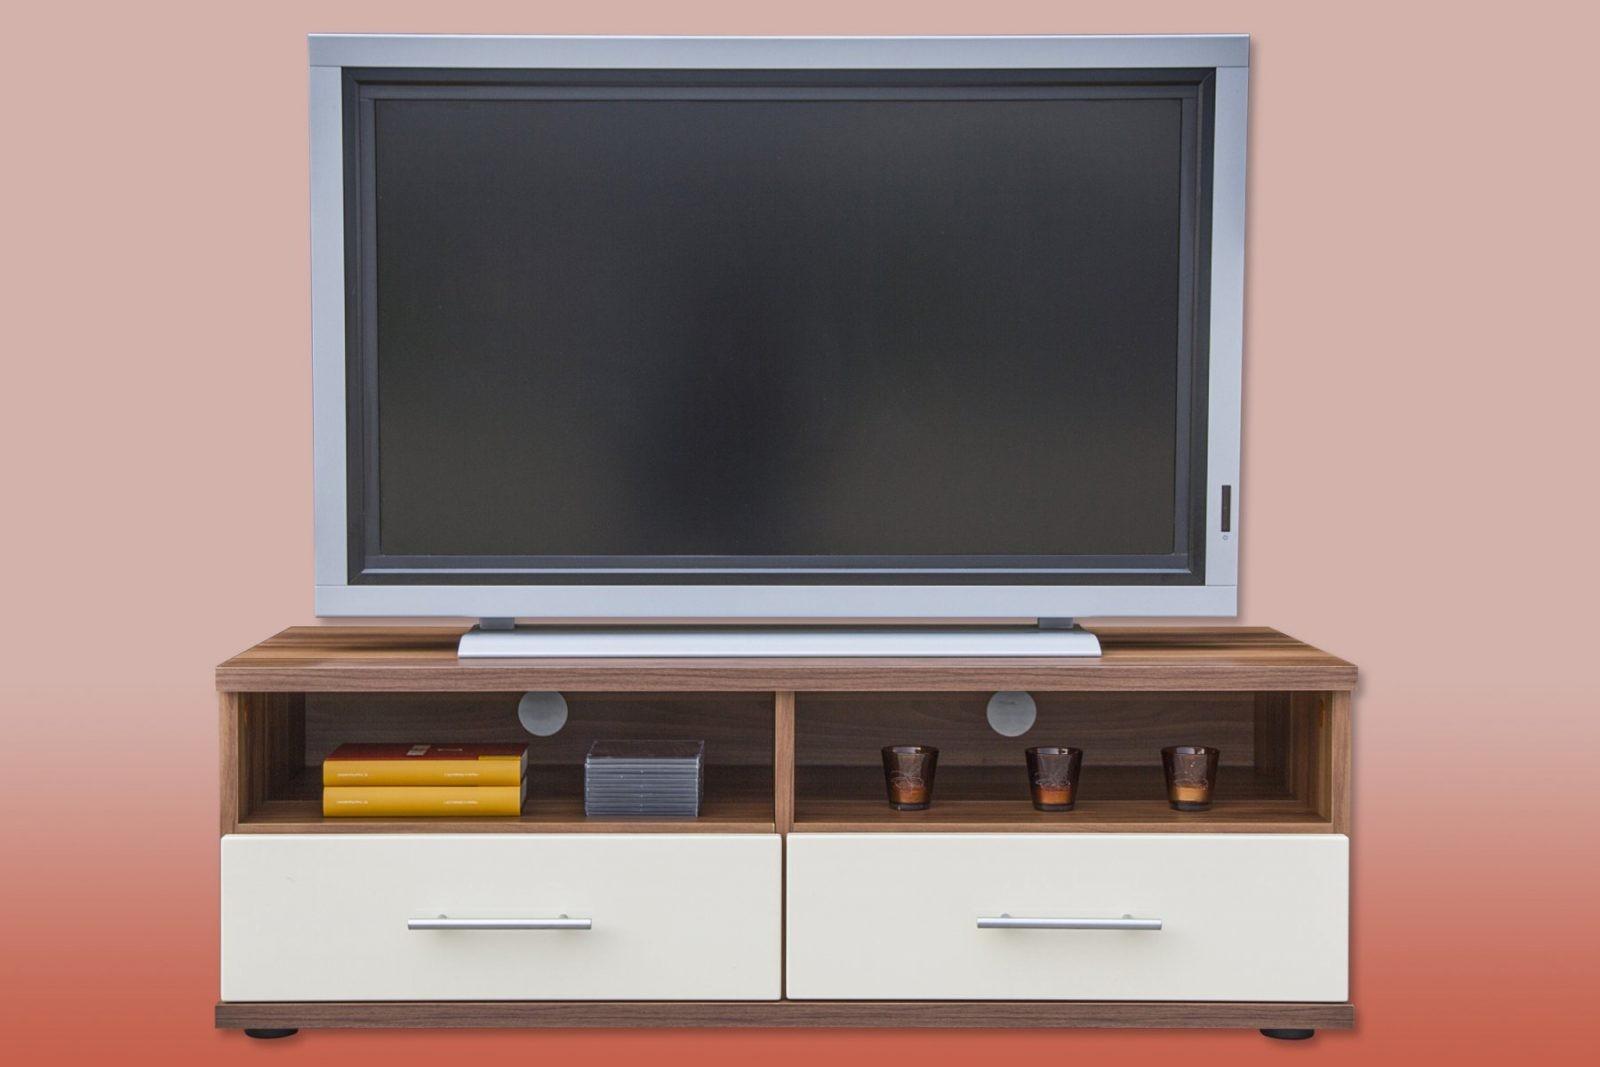 Tv Schrank Nussbaum Xana Möbel Massivholz Tv Möbel Tv Schrank Tv von Tv Schrank Für Ecke Bild